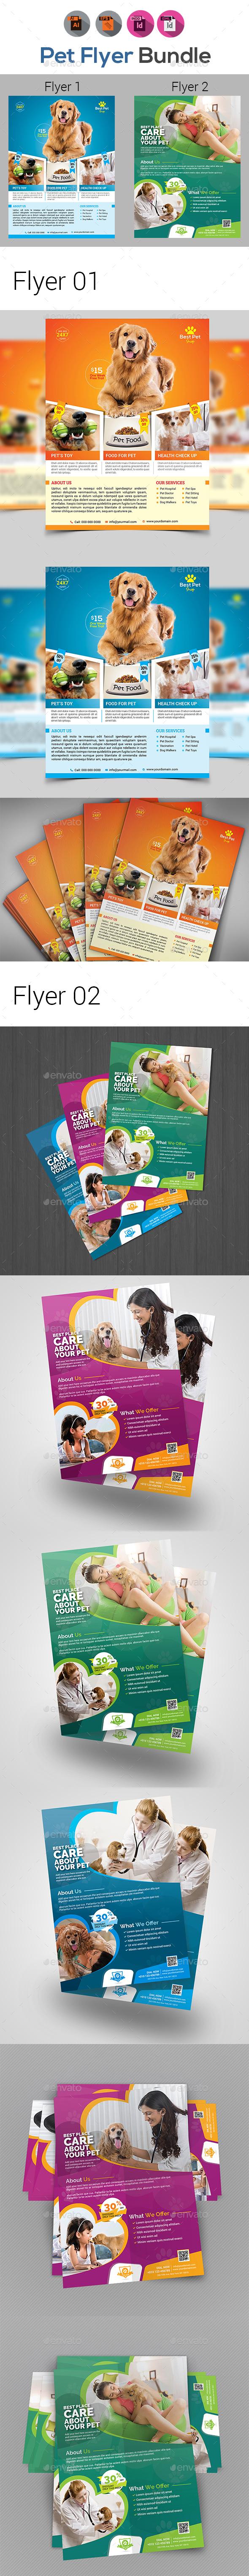 Pets Flyer Template Bundle V3 - Corporate Flyers